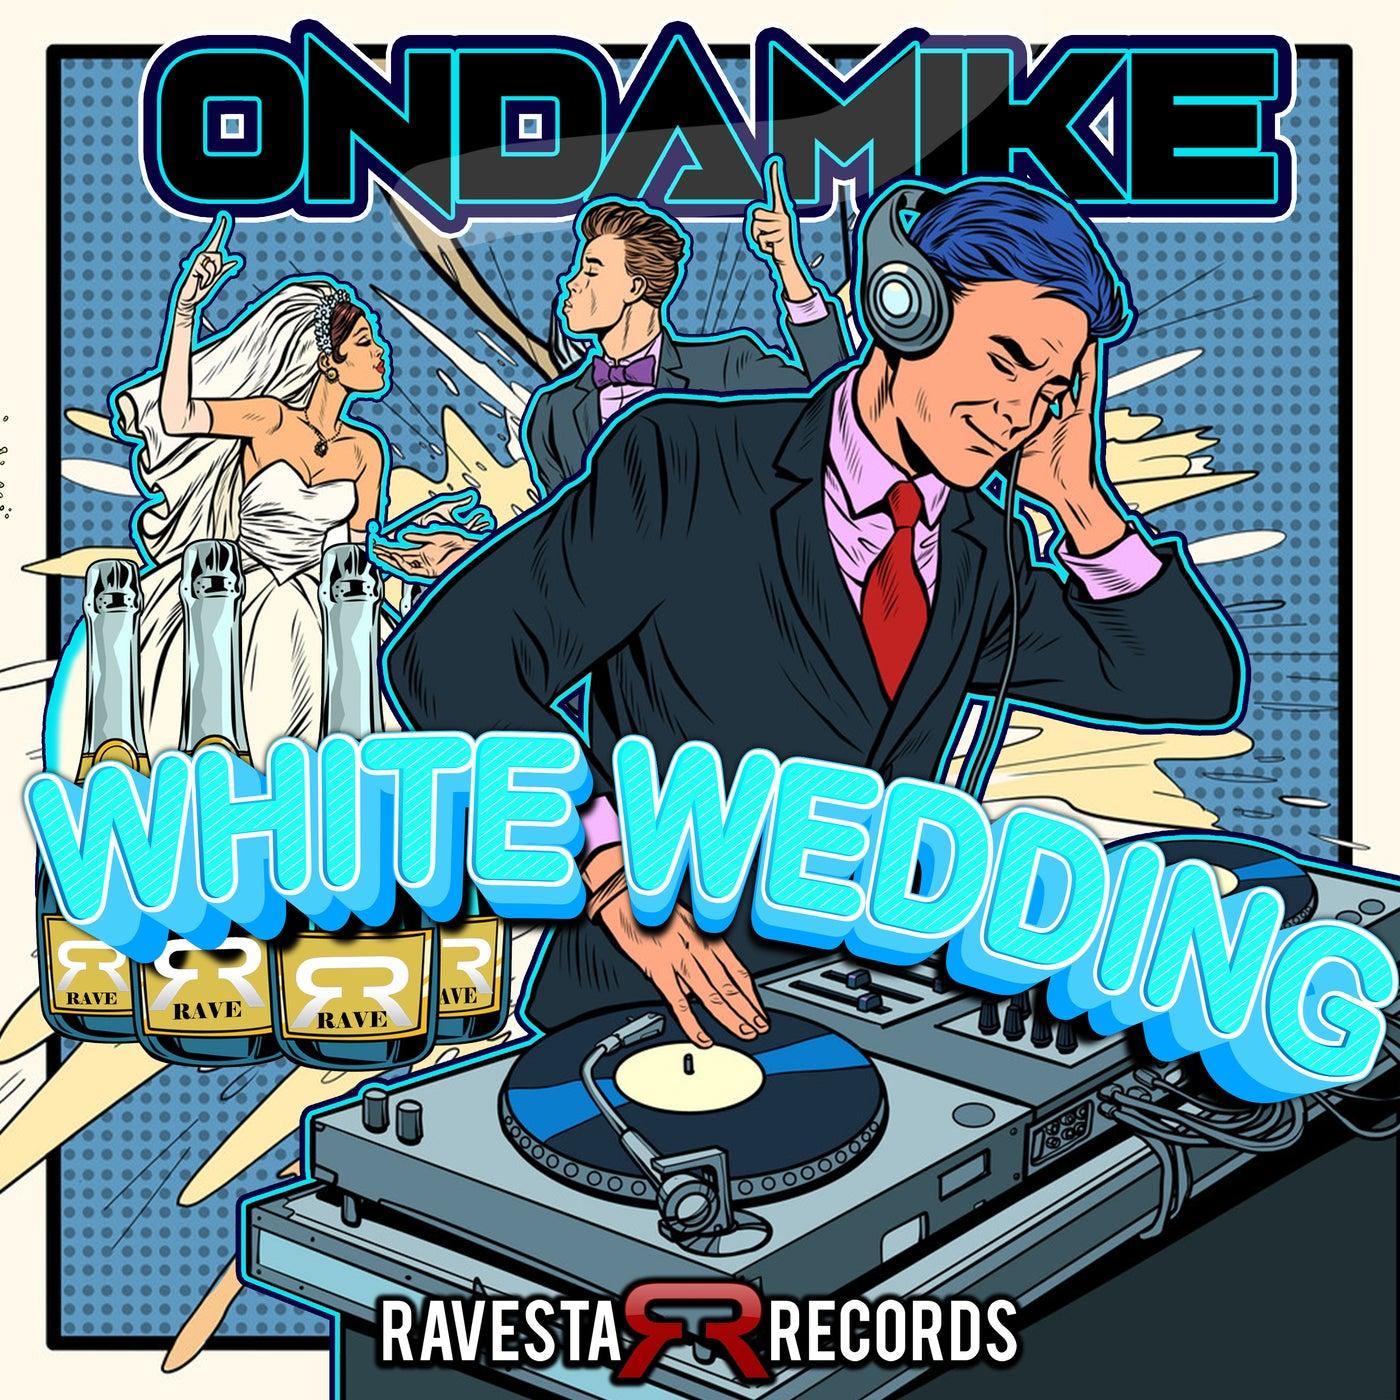 White Wedding (Extended Mix)